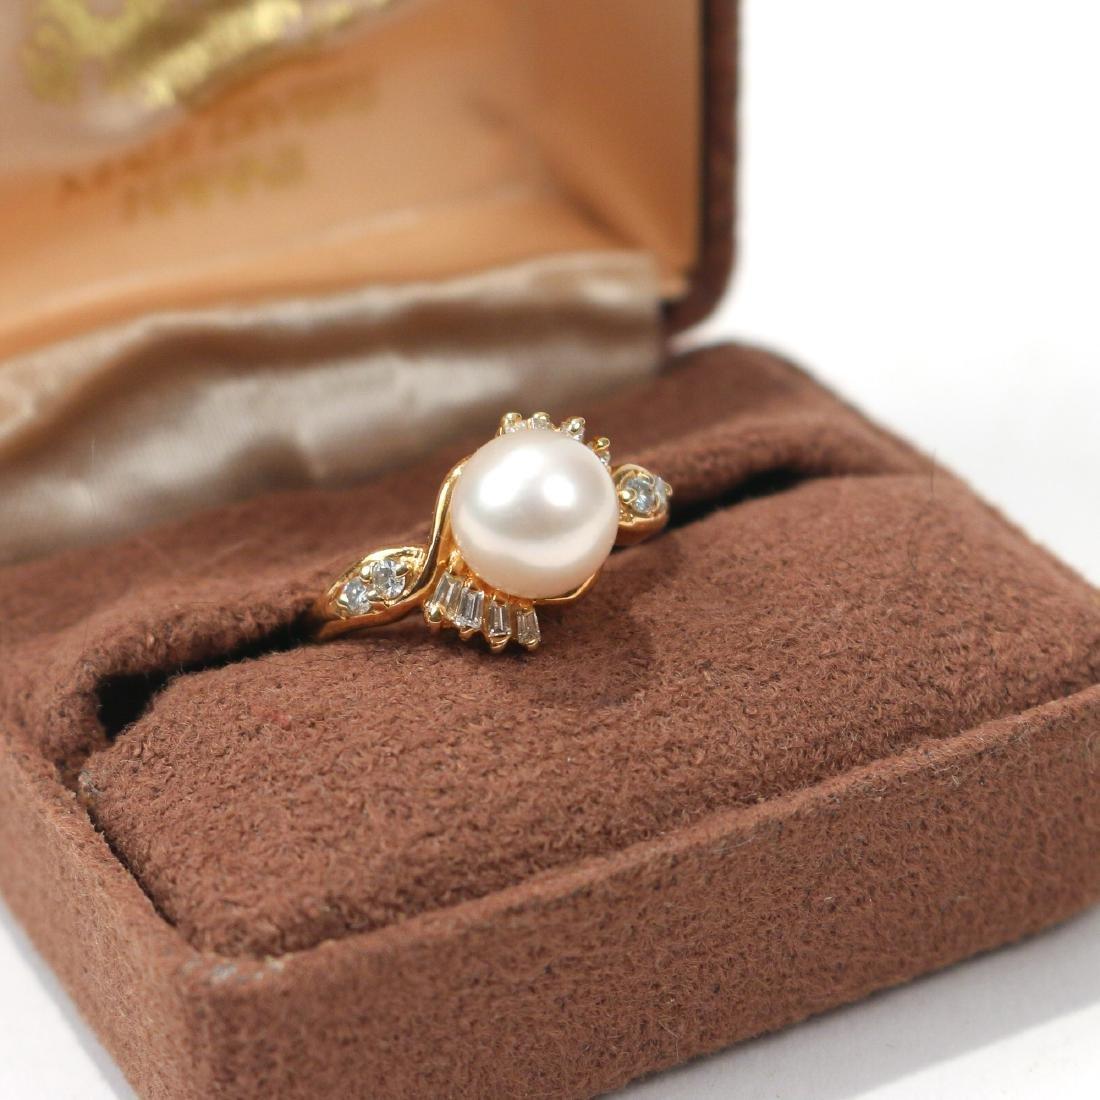 MAUI DIVER'S PEARL & DIAMOND RING - 3